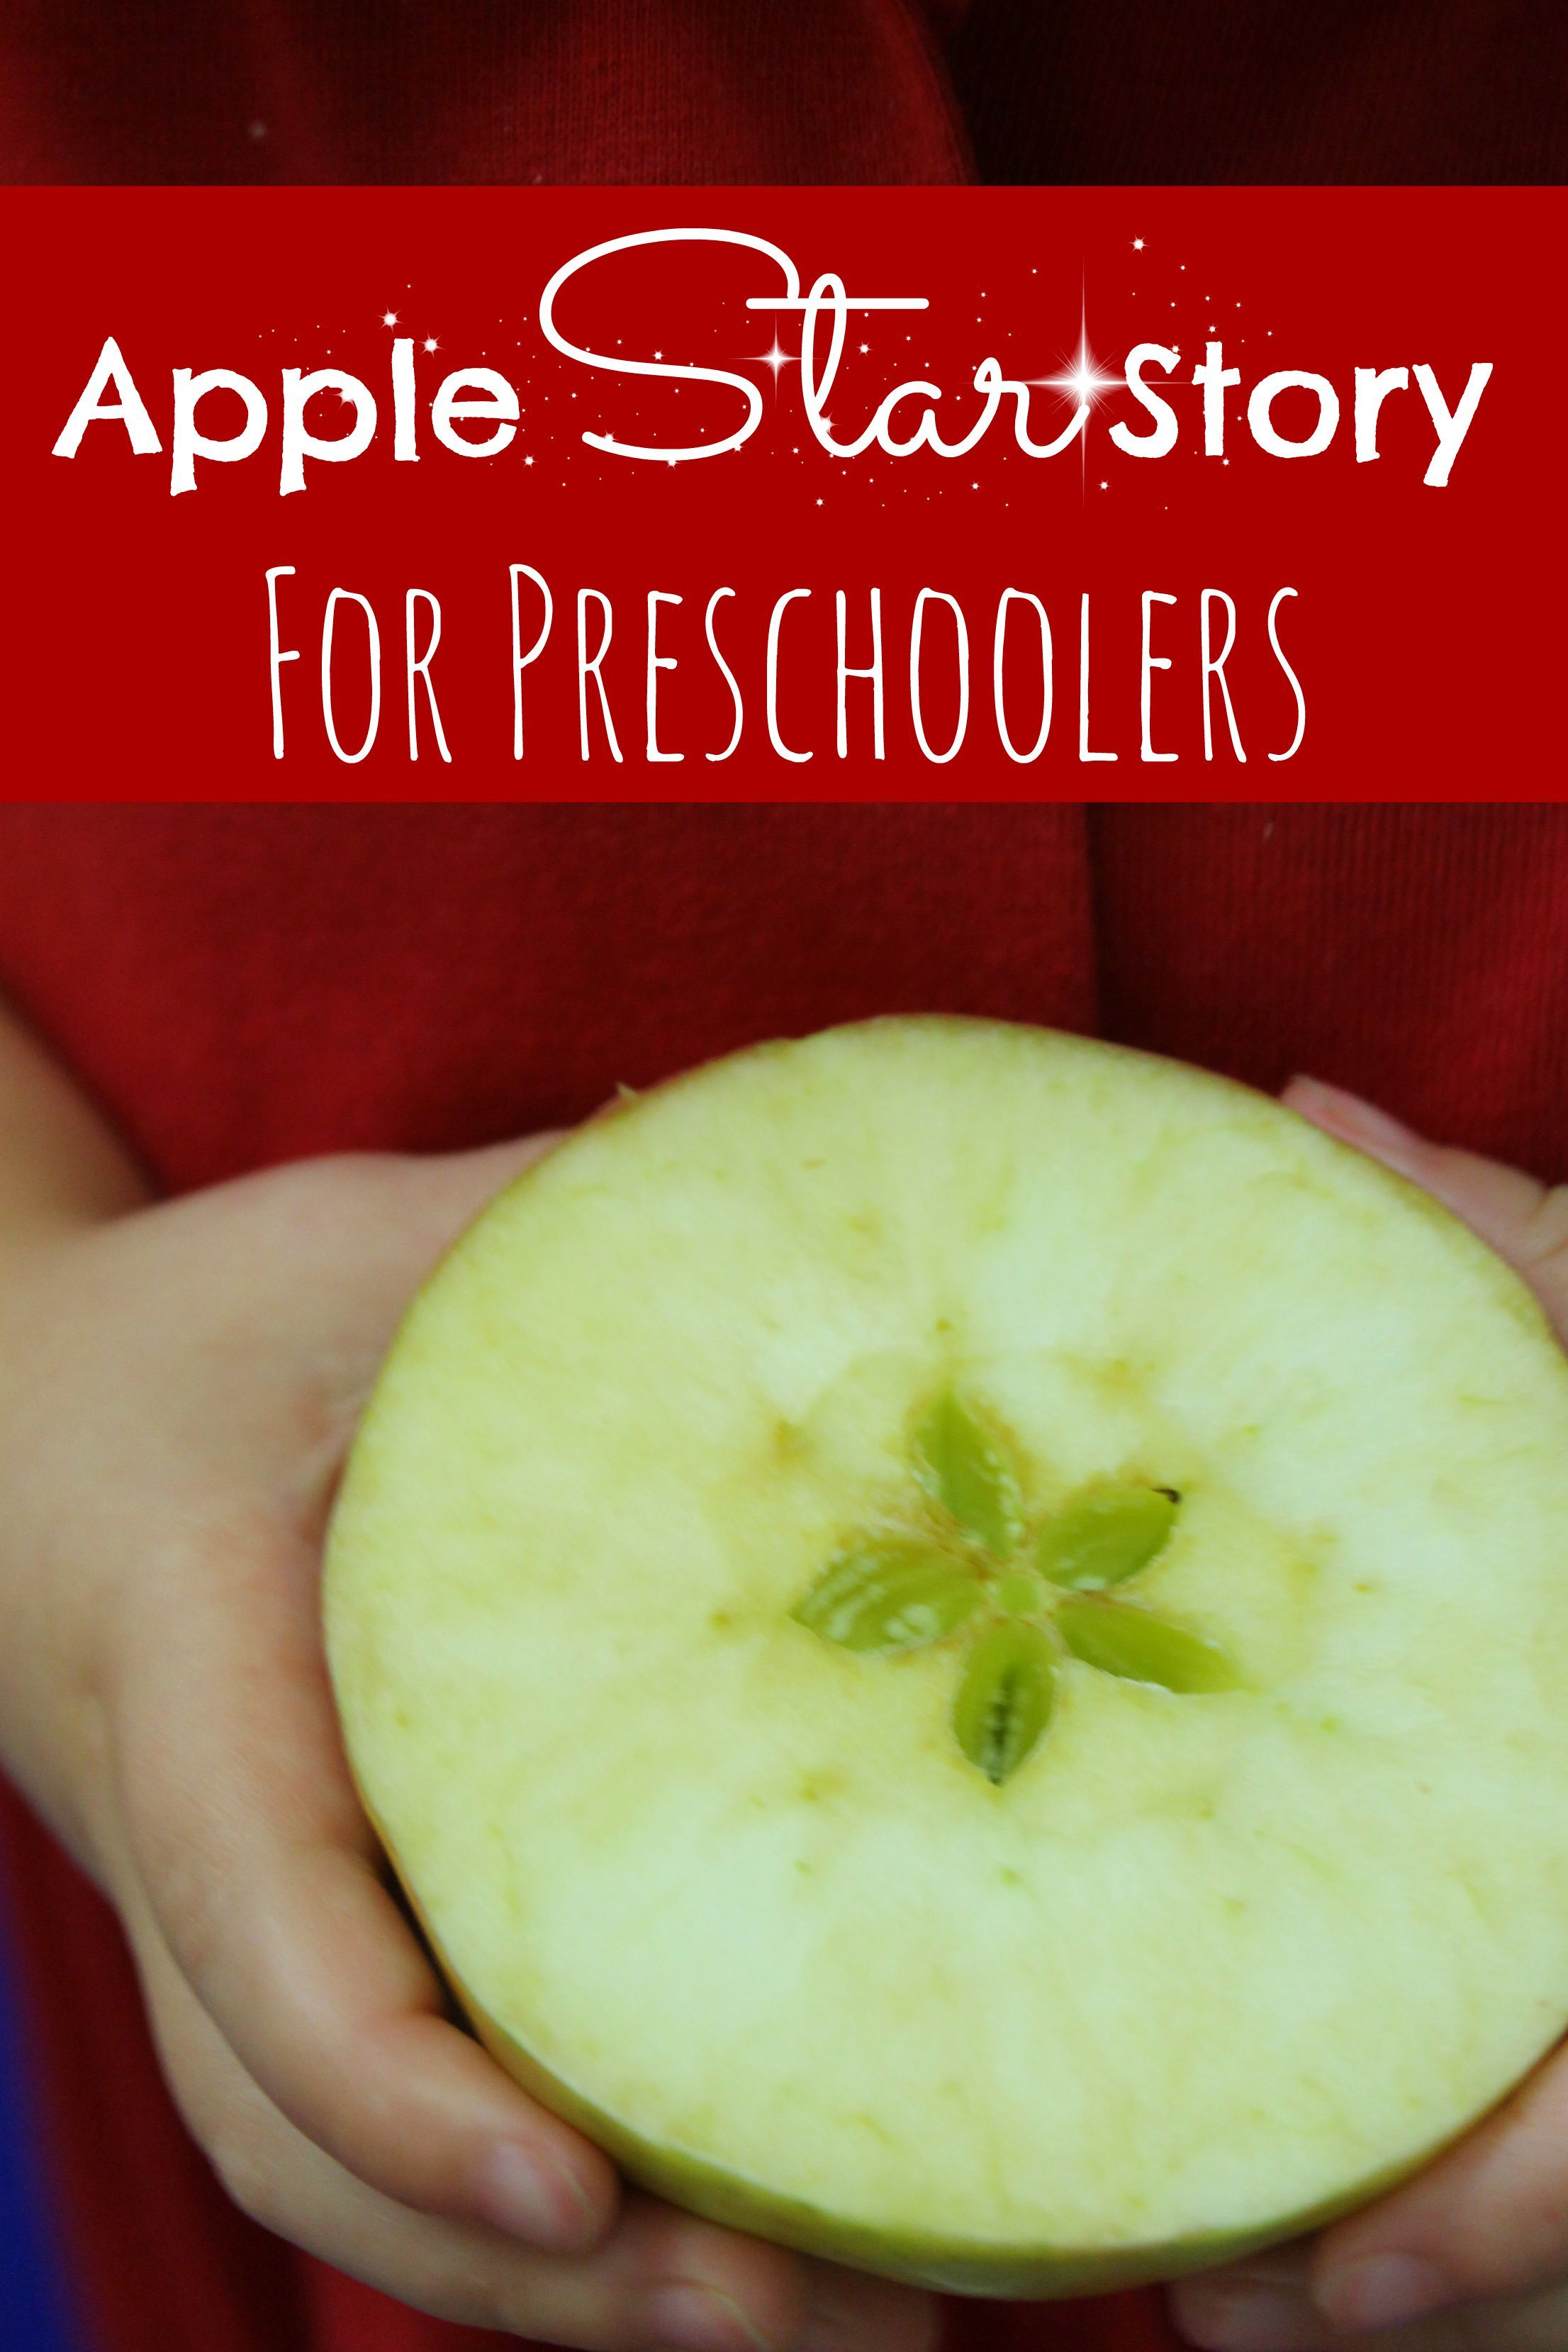 Apple Star Story For Preschoolers